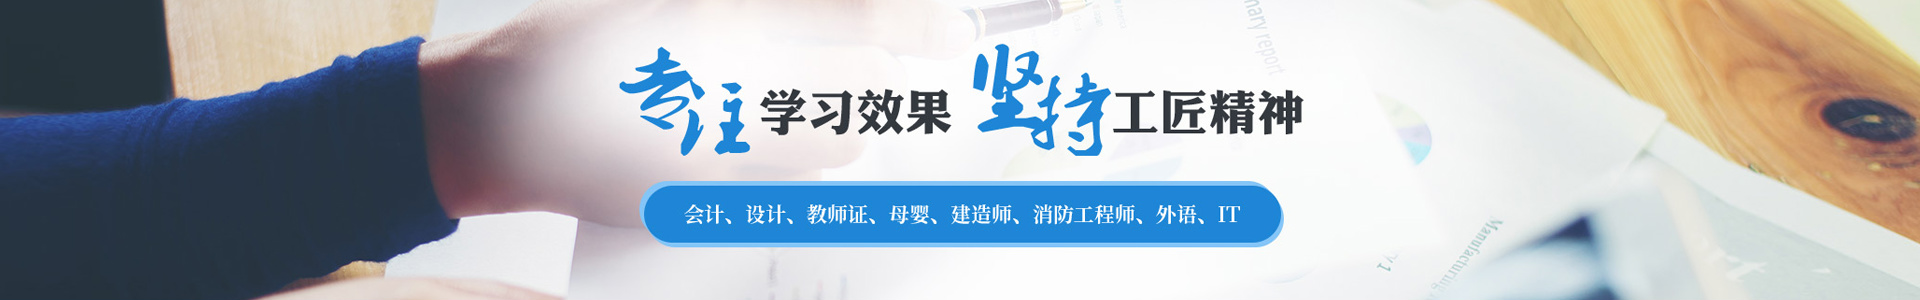 揚州上元教育